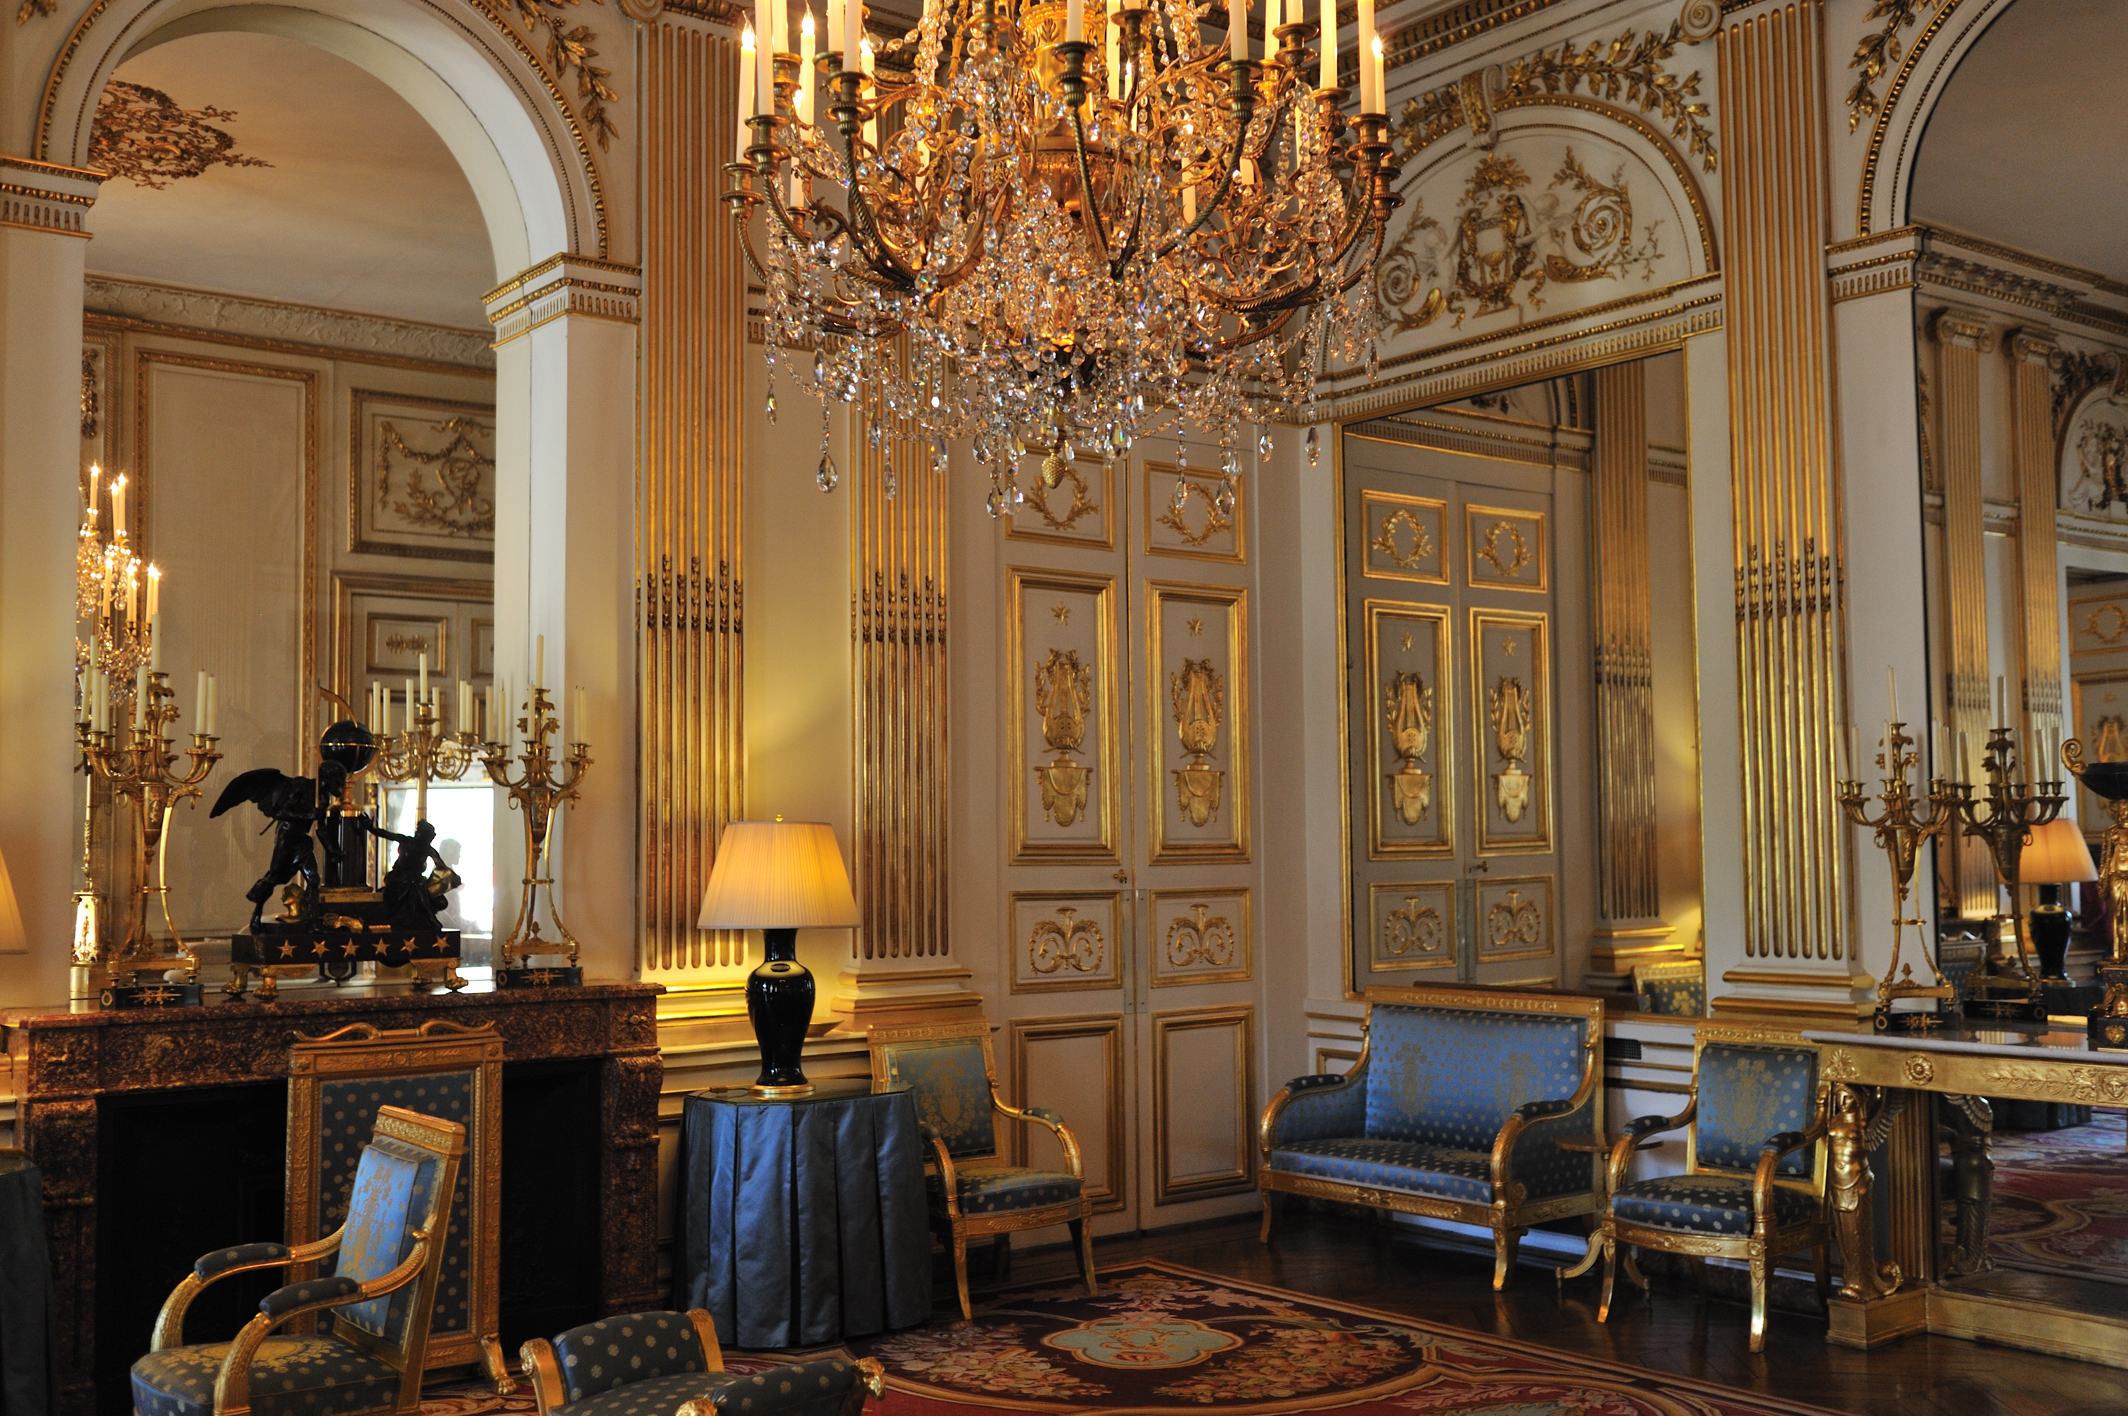 Hôtel_de_Charost_JP2010_salon_bleu_1 furniture